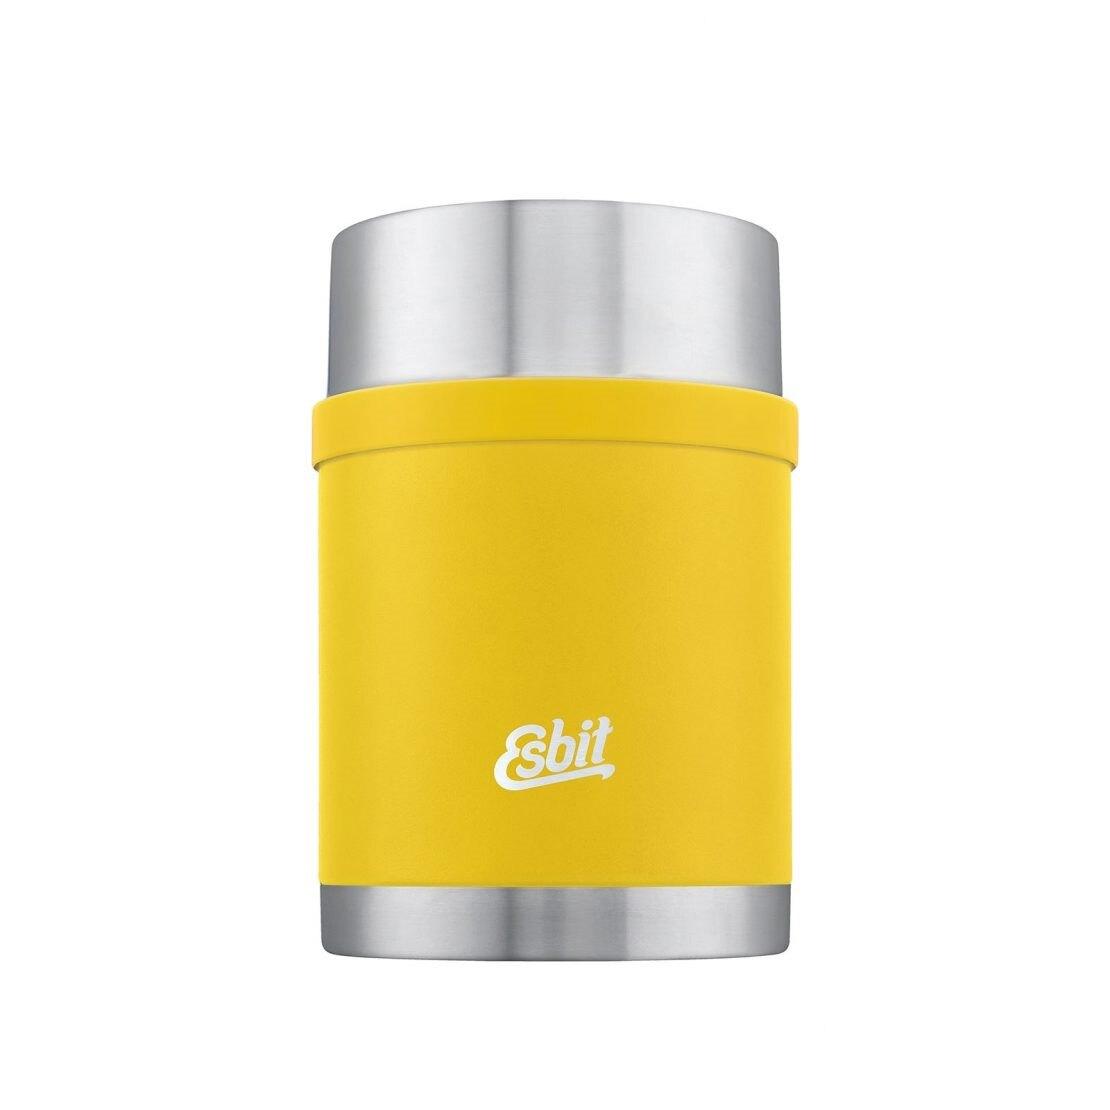 Nerezová termoska na jedlo Sculptor ESBIT® 0,75 l – Žltá (Farba: Žltá)